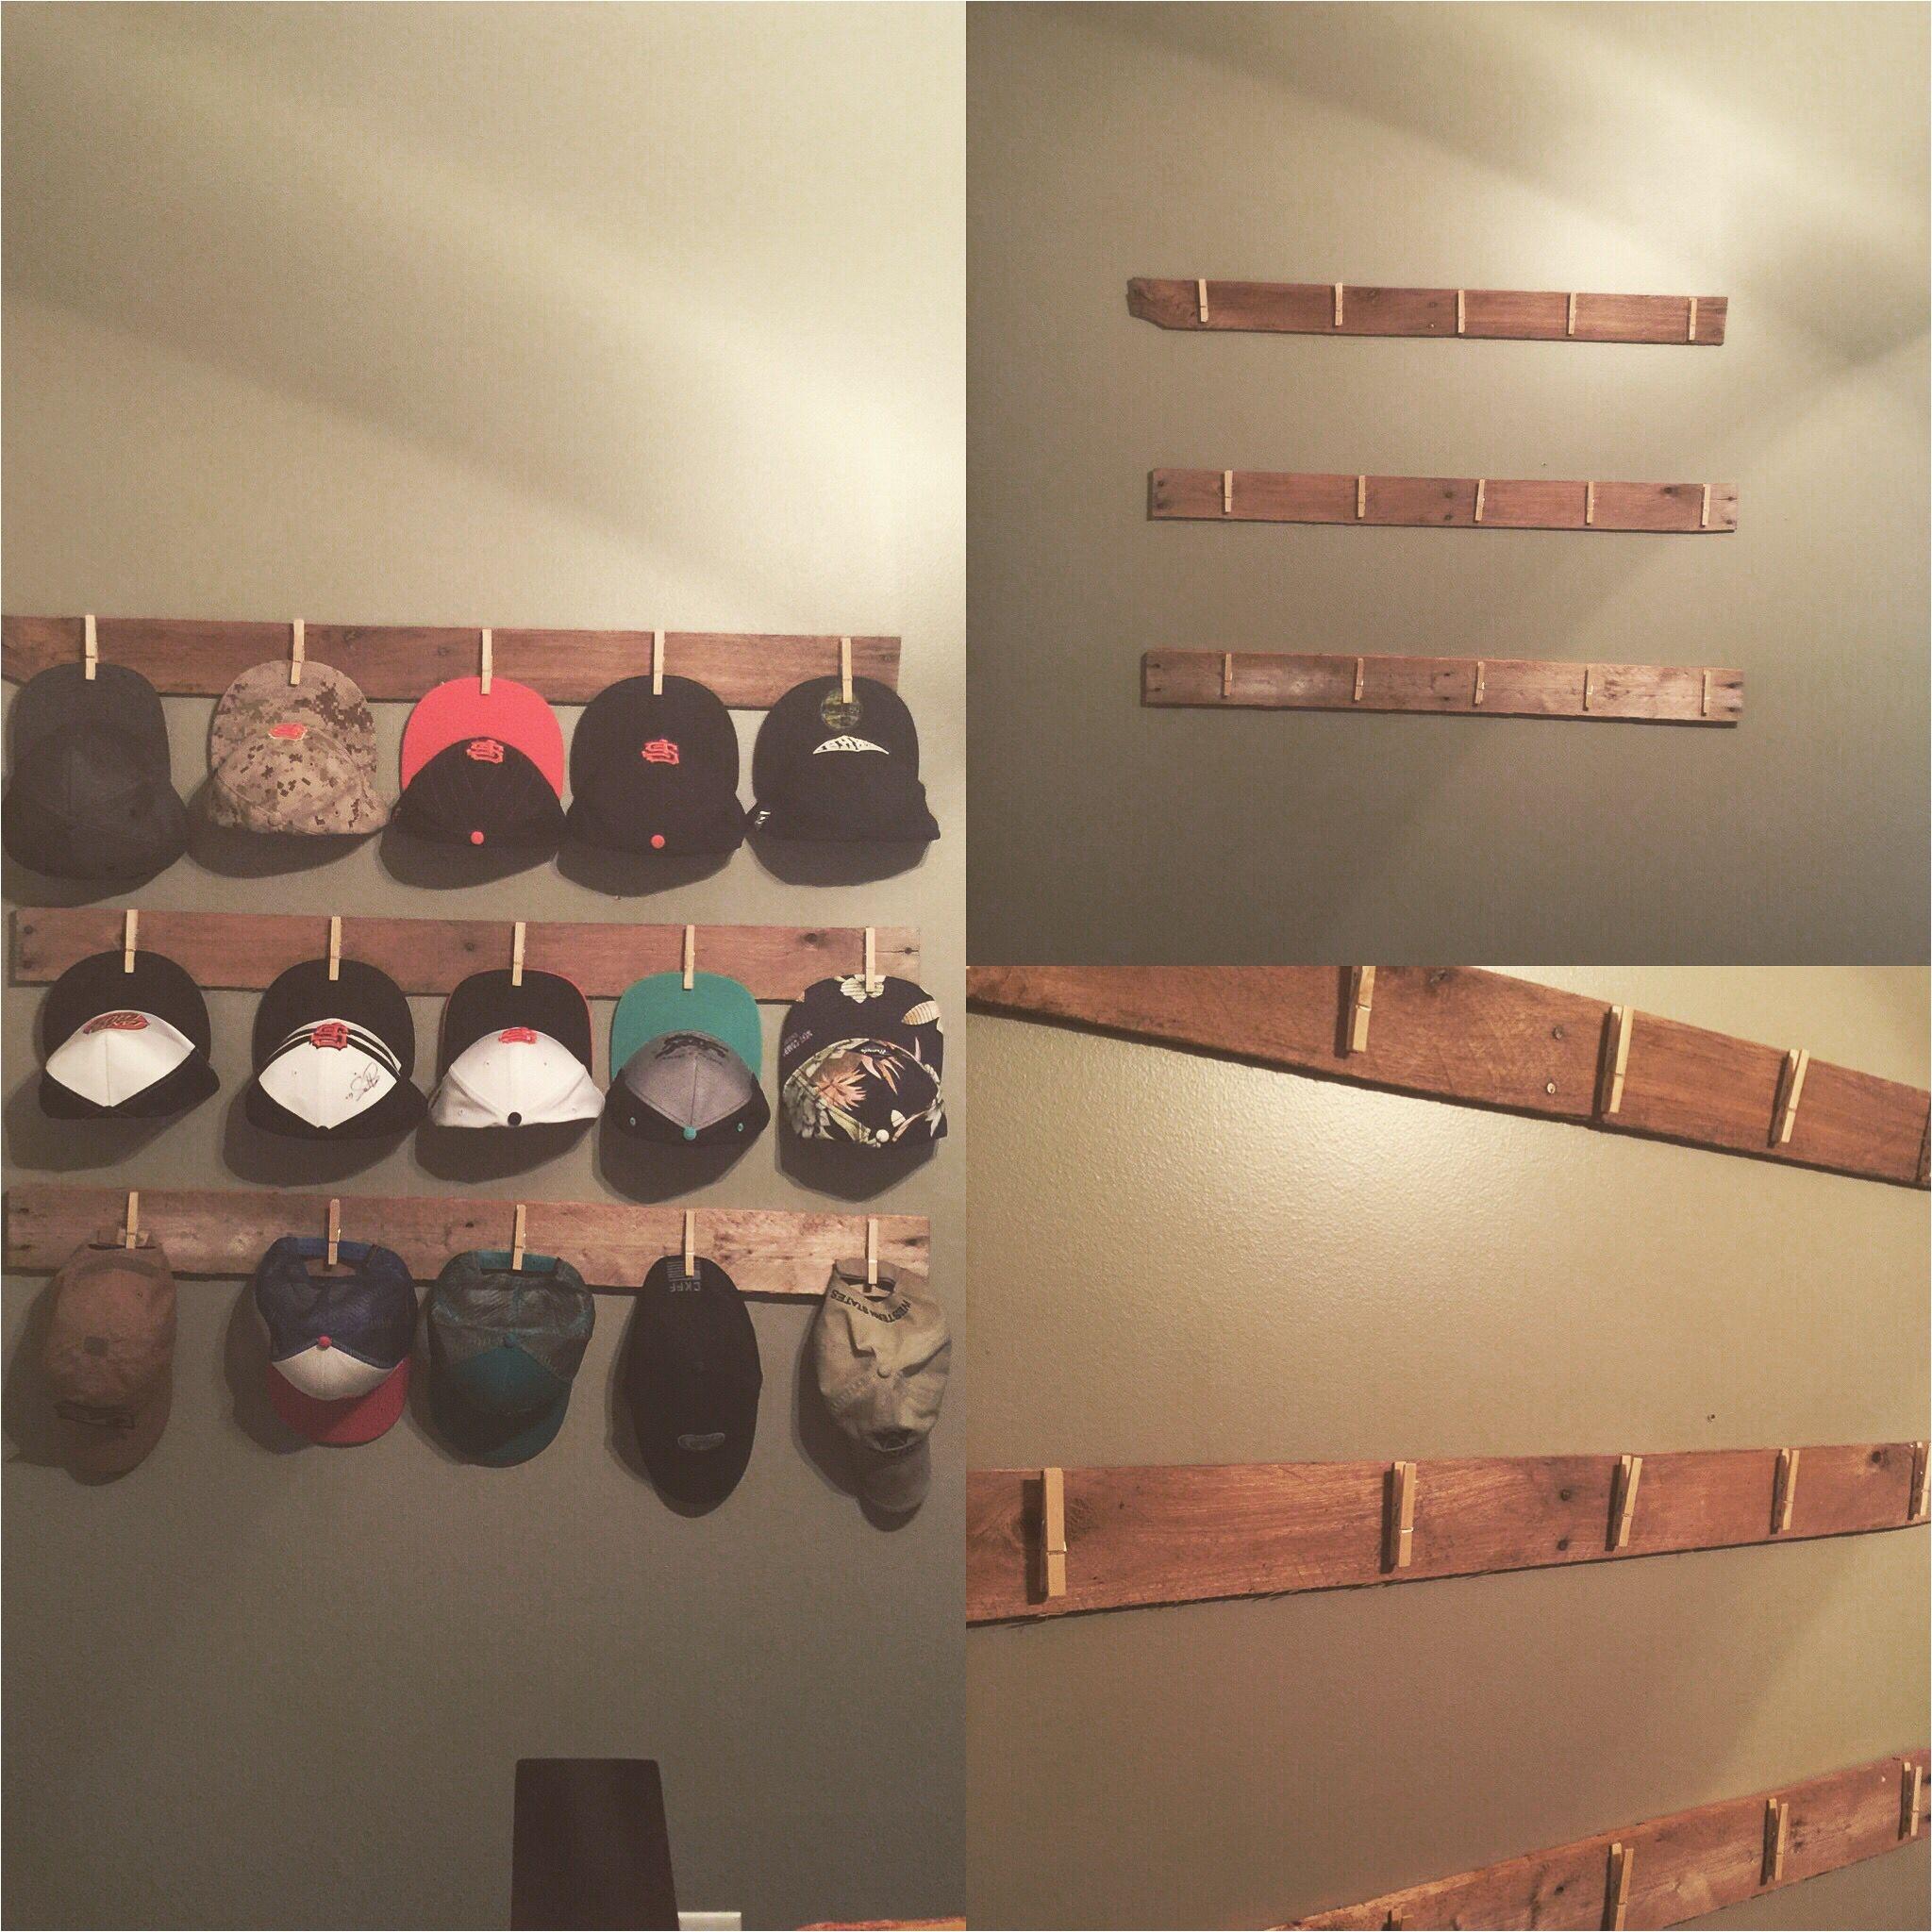 best ideas about diy hat rack ideas on pinterest hat holder hat organization hat hanger and hat hanger